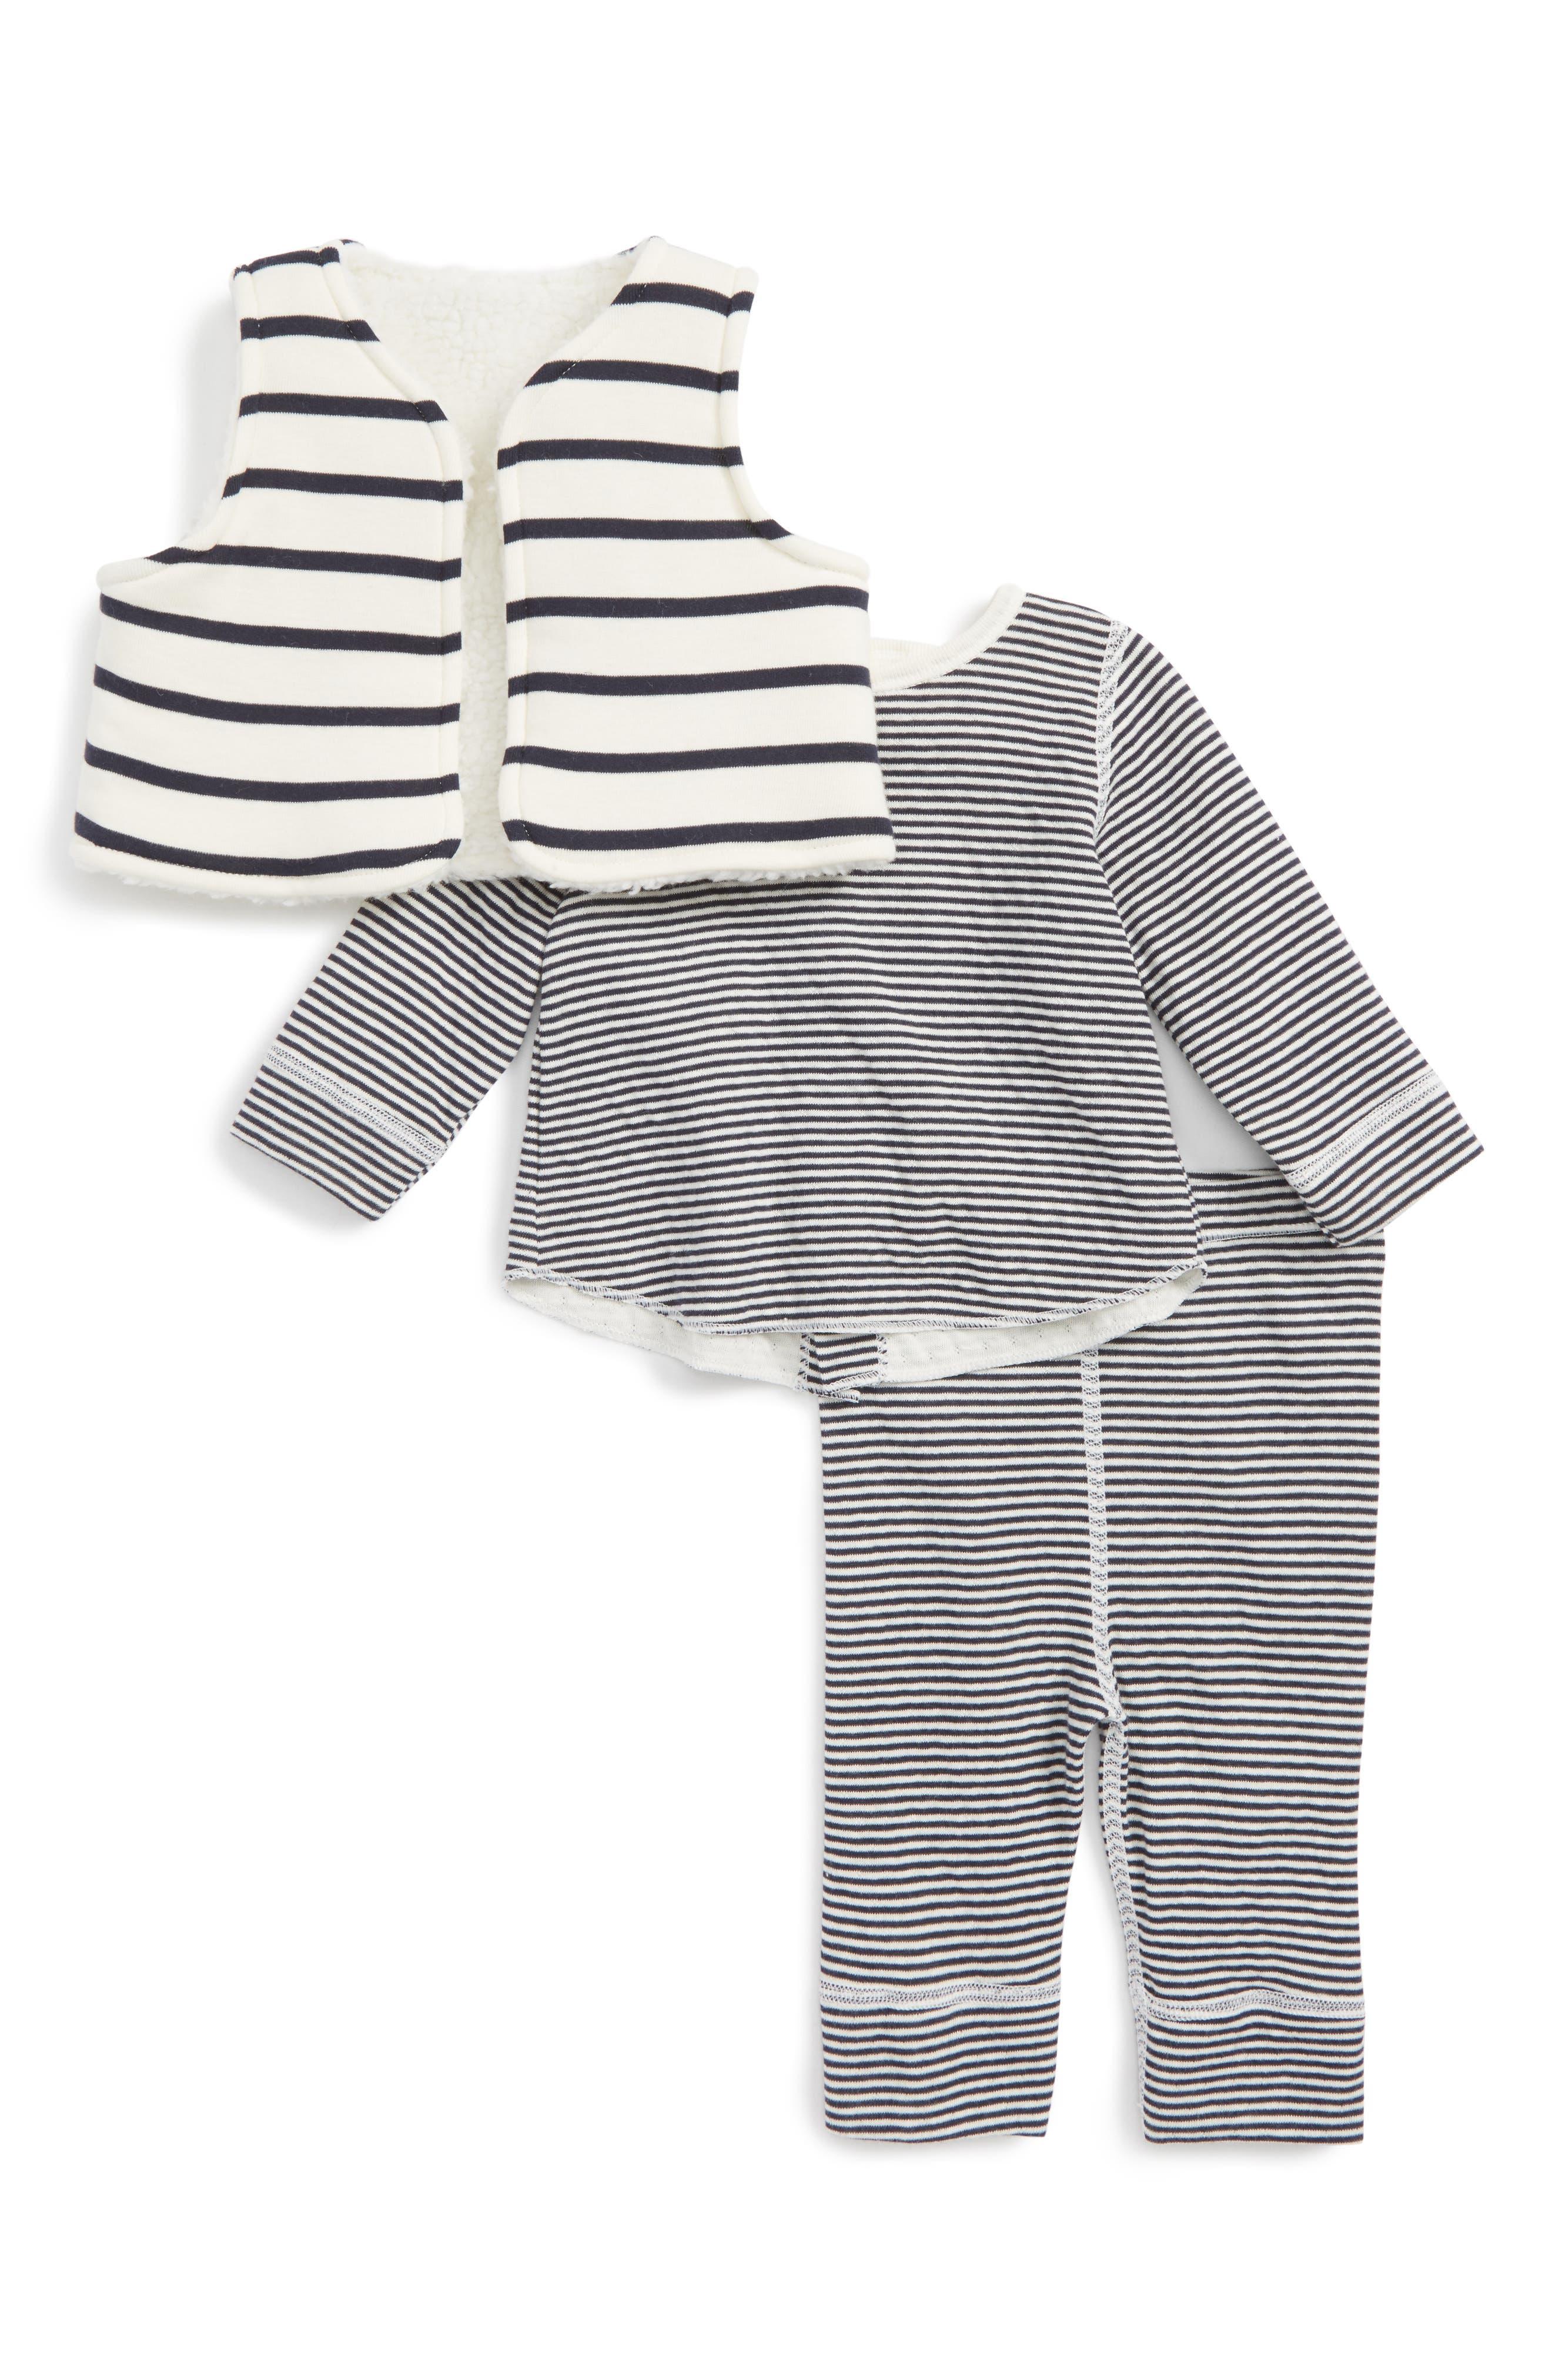 Main Image - Petit Bateau Stripe Vest, Tee & Leggings Set (Baby)